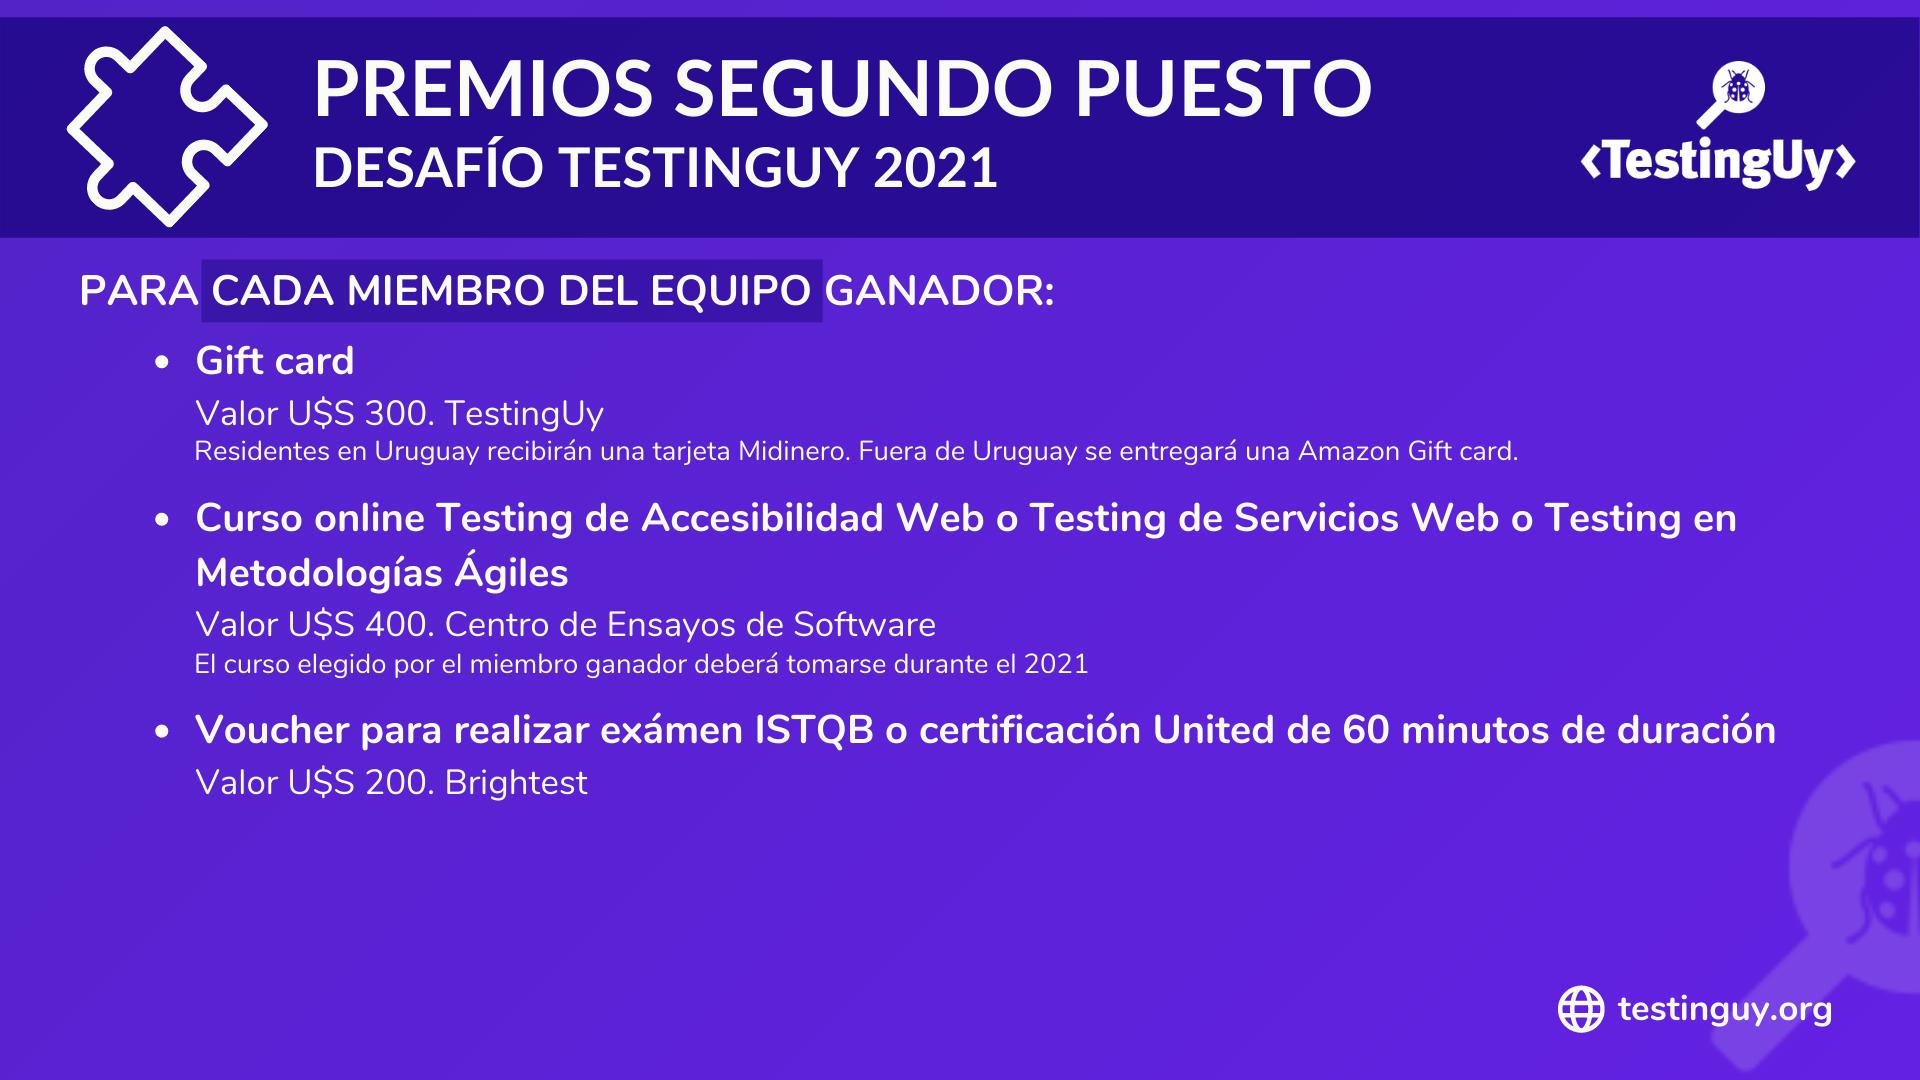 Desafio TestingUy 2021 - Premios Segundo puesto